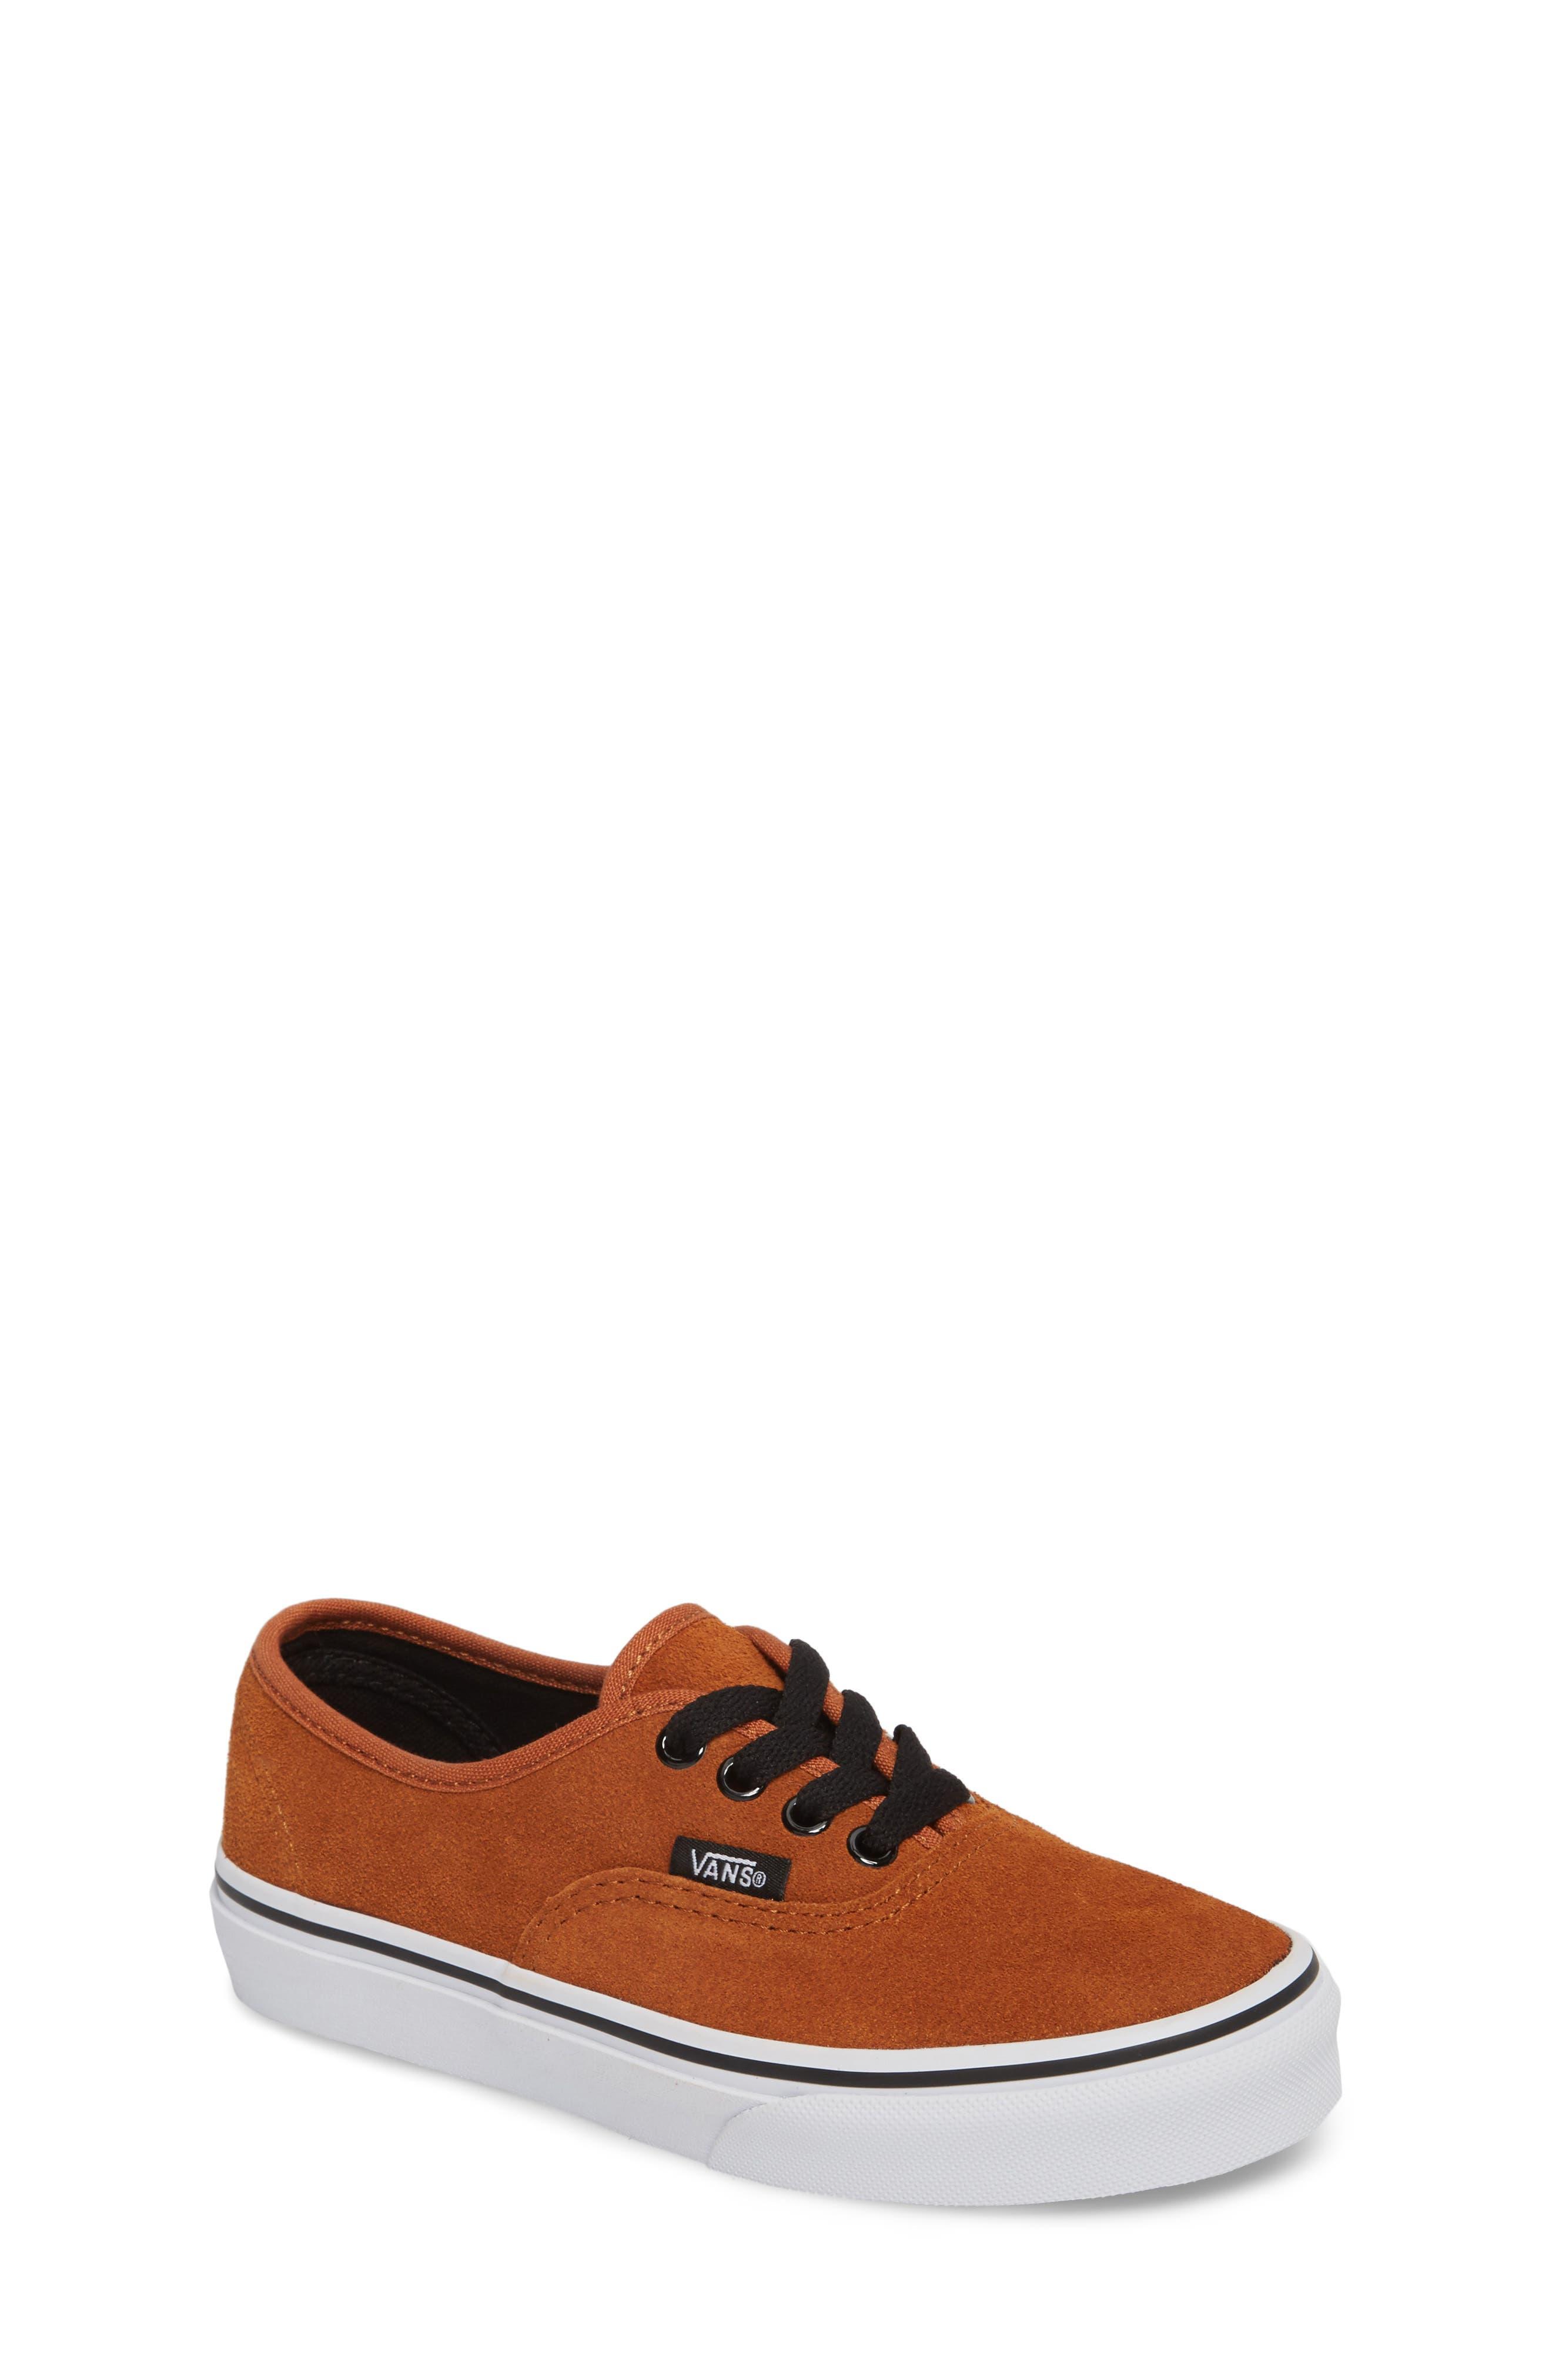 Main Image - Vans Authentic Sneaker (Baby, Walker, Toddler, Little Kid & Big Kid)